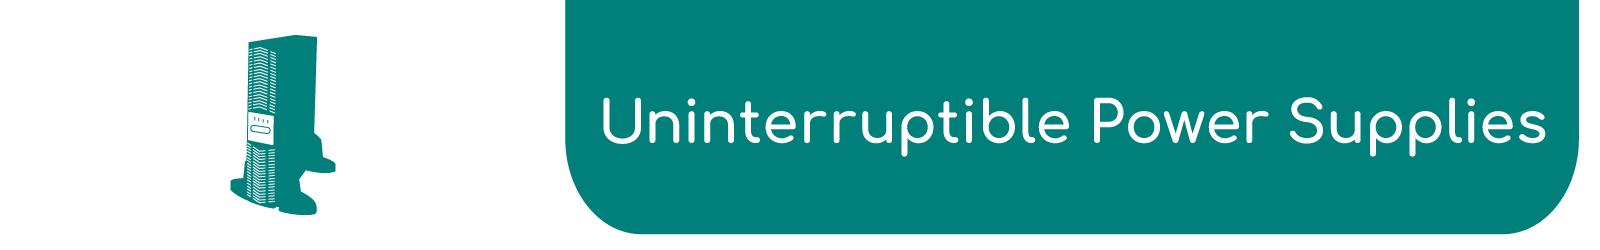 Uninterruptible Power Supplies - Electronic Communication Services